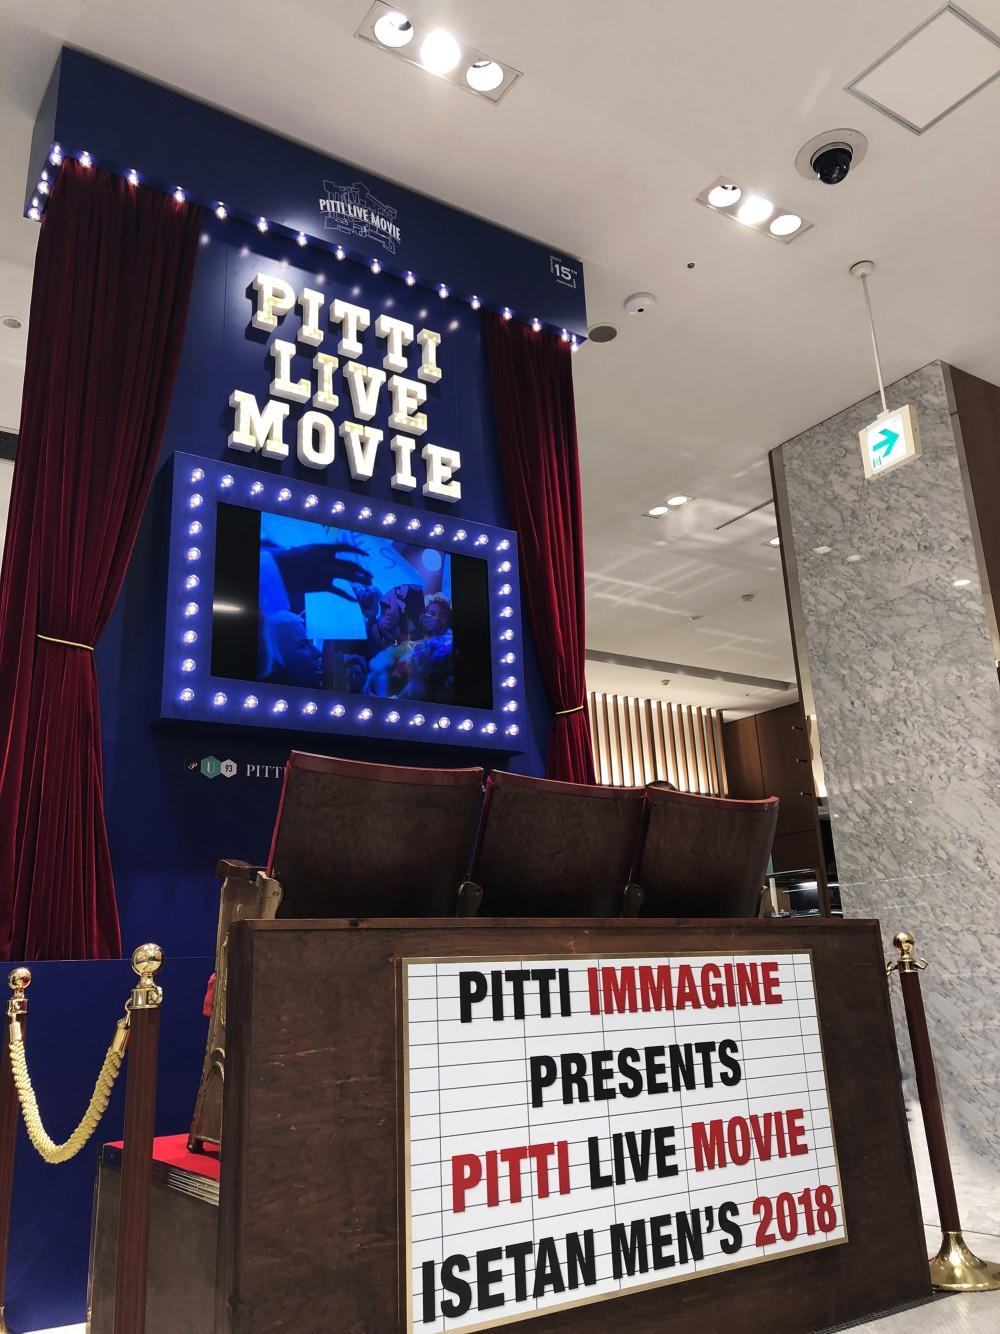 "PITTI IMMAGINE UOMO 93 ""PITTI LIVE MOVIE"" at ISETAN MEN'S"